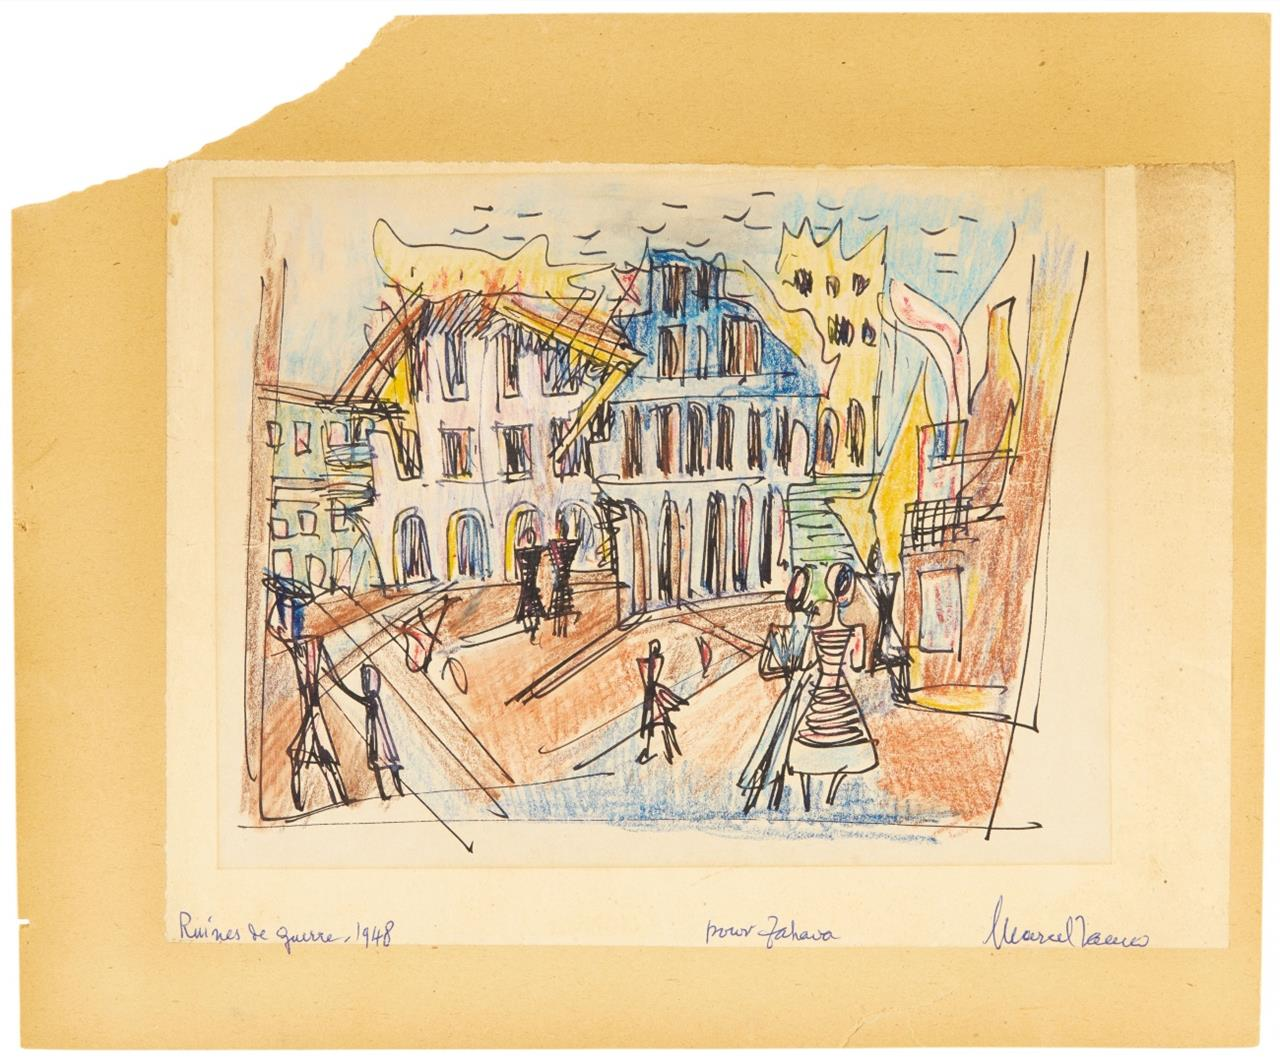 Marcel Janco. Ruines de Guerre. 1948. Tusche und Farbkreide. Signiert, mit Widmung 'pour Zahava'.